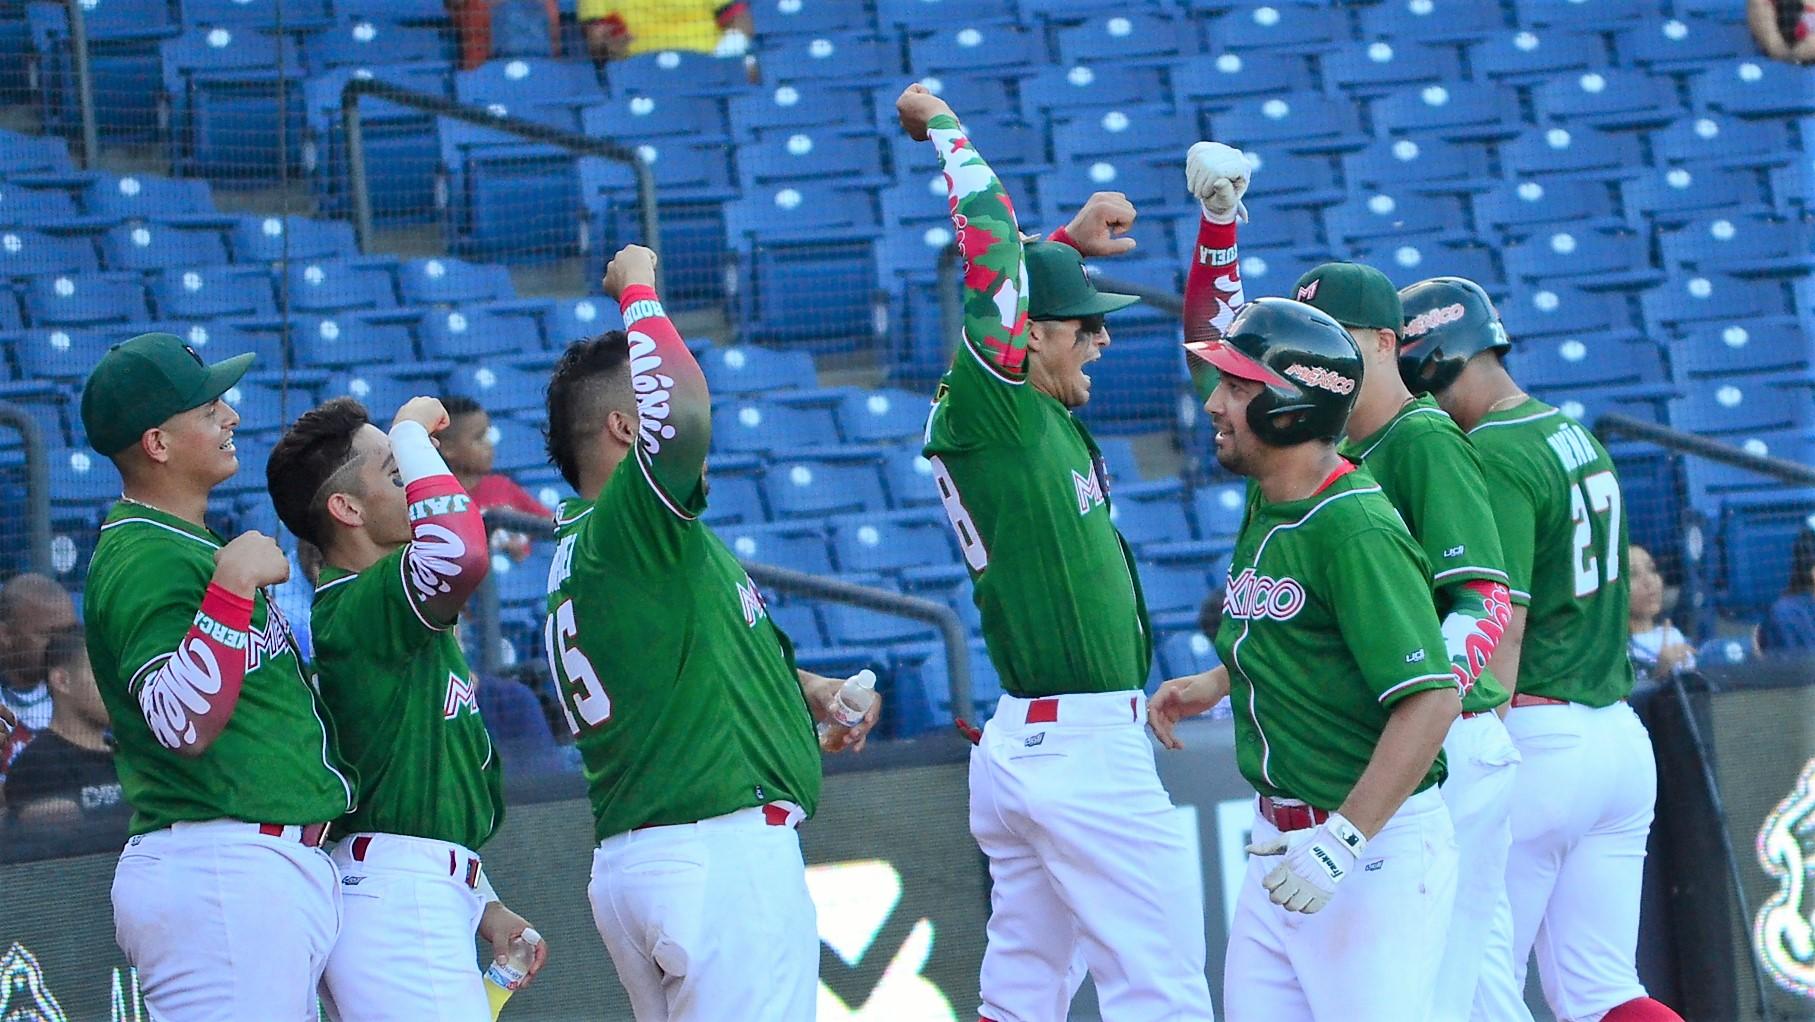 Mexico enjoyed a four-home run night